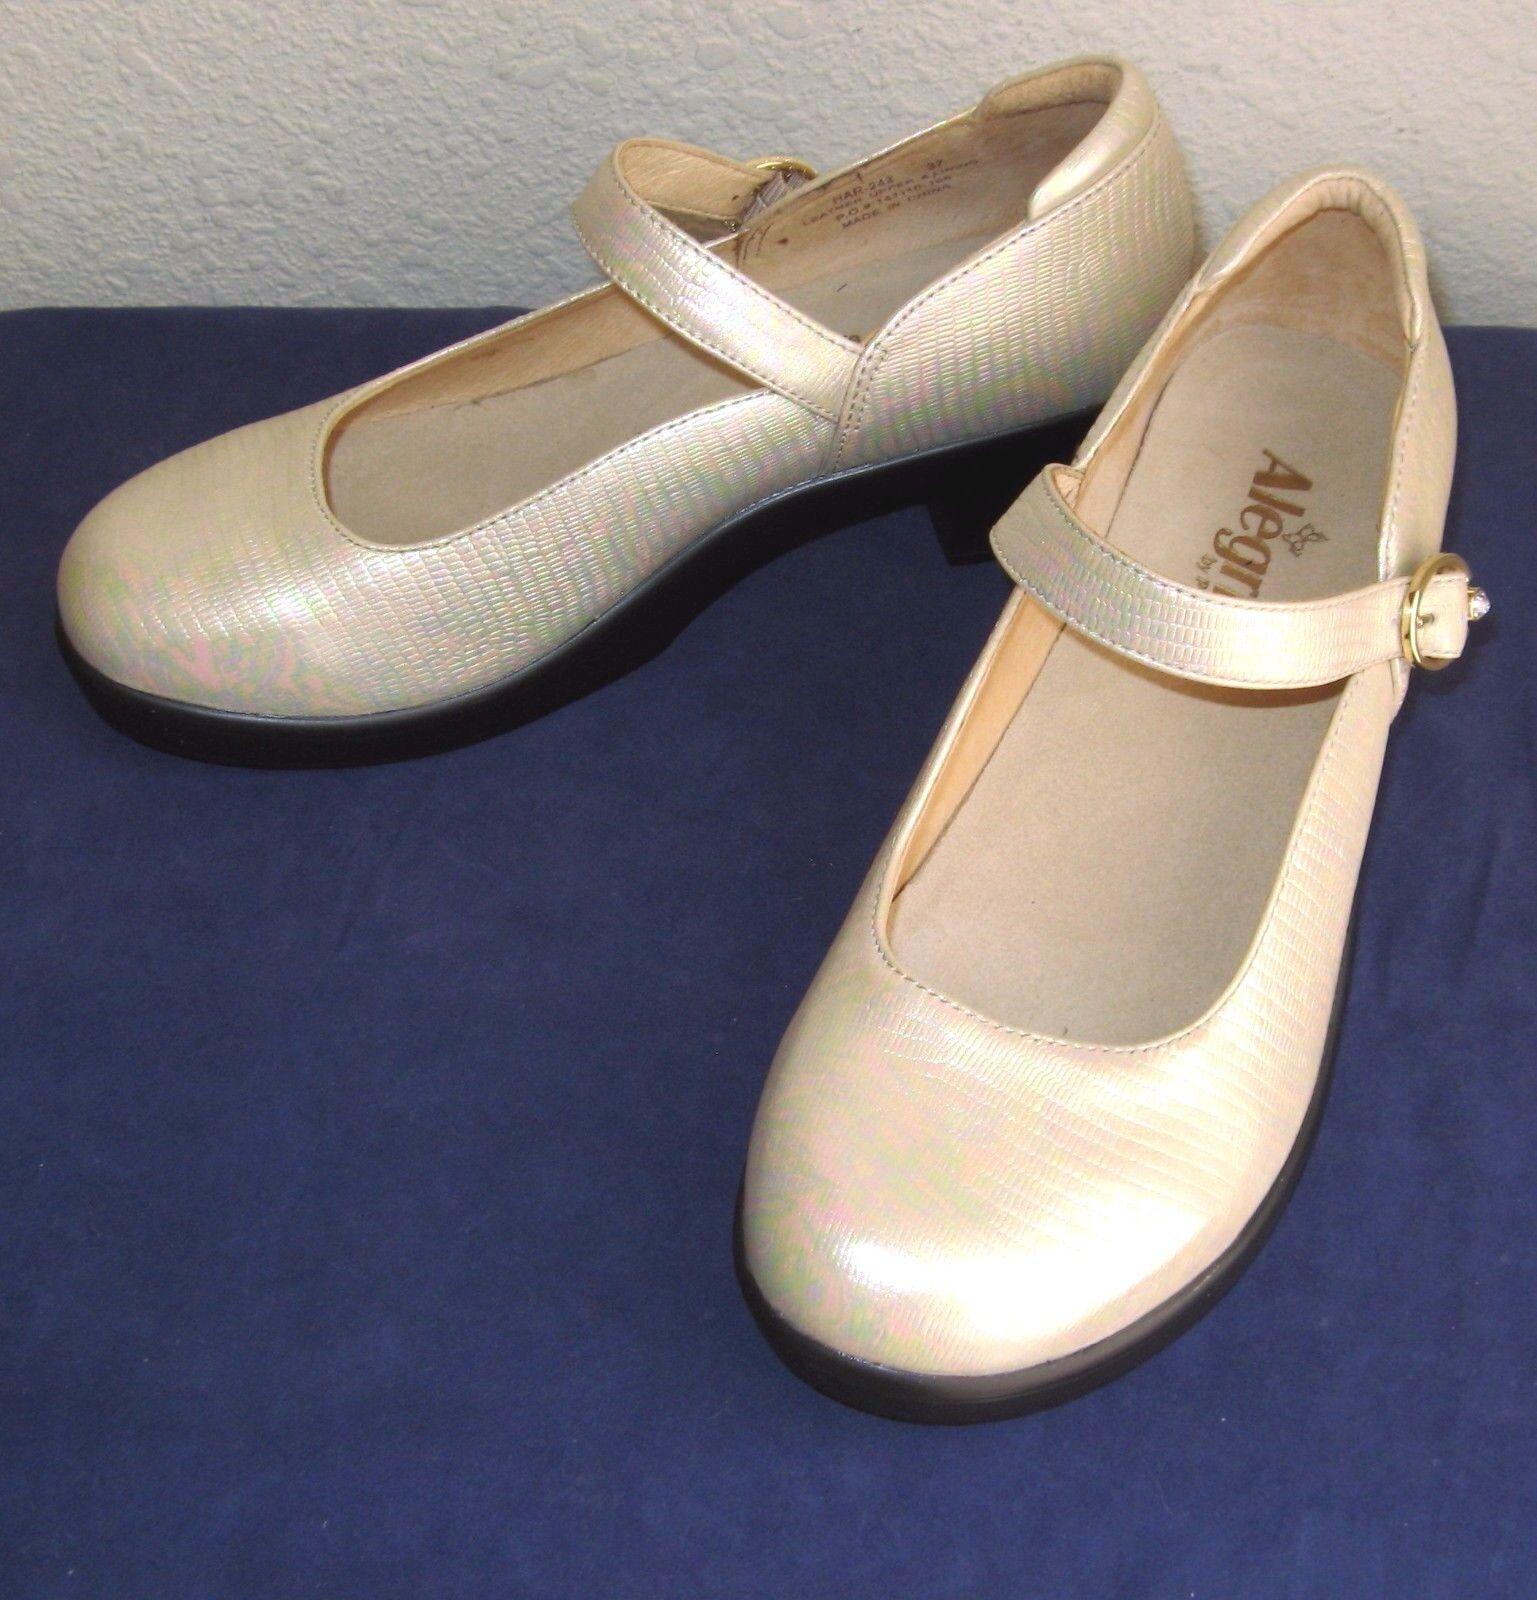 New Alegria  PG Lite Sz EU 37 US 6.5  Harper  Abalone Mary Jane Style shoes  C4